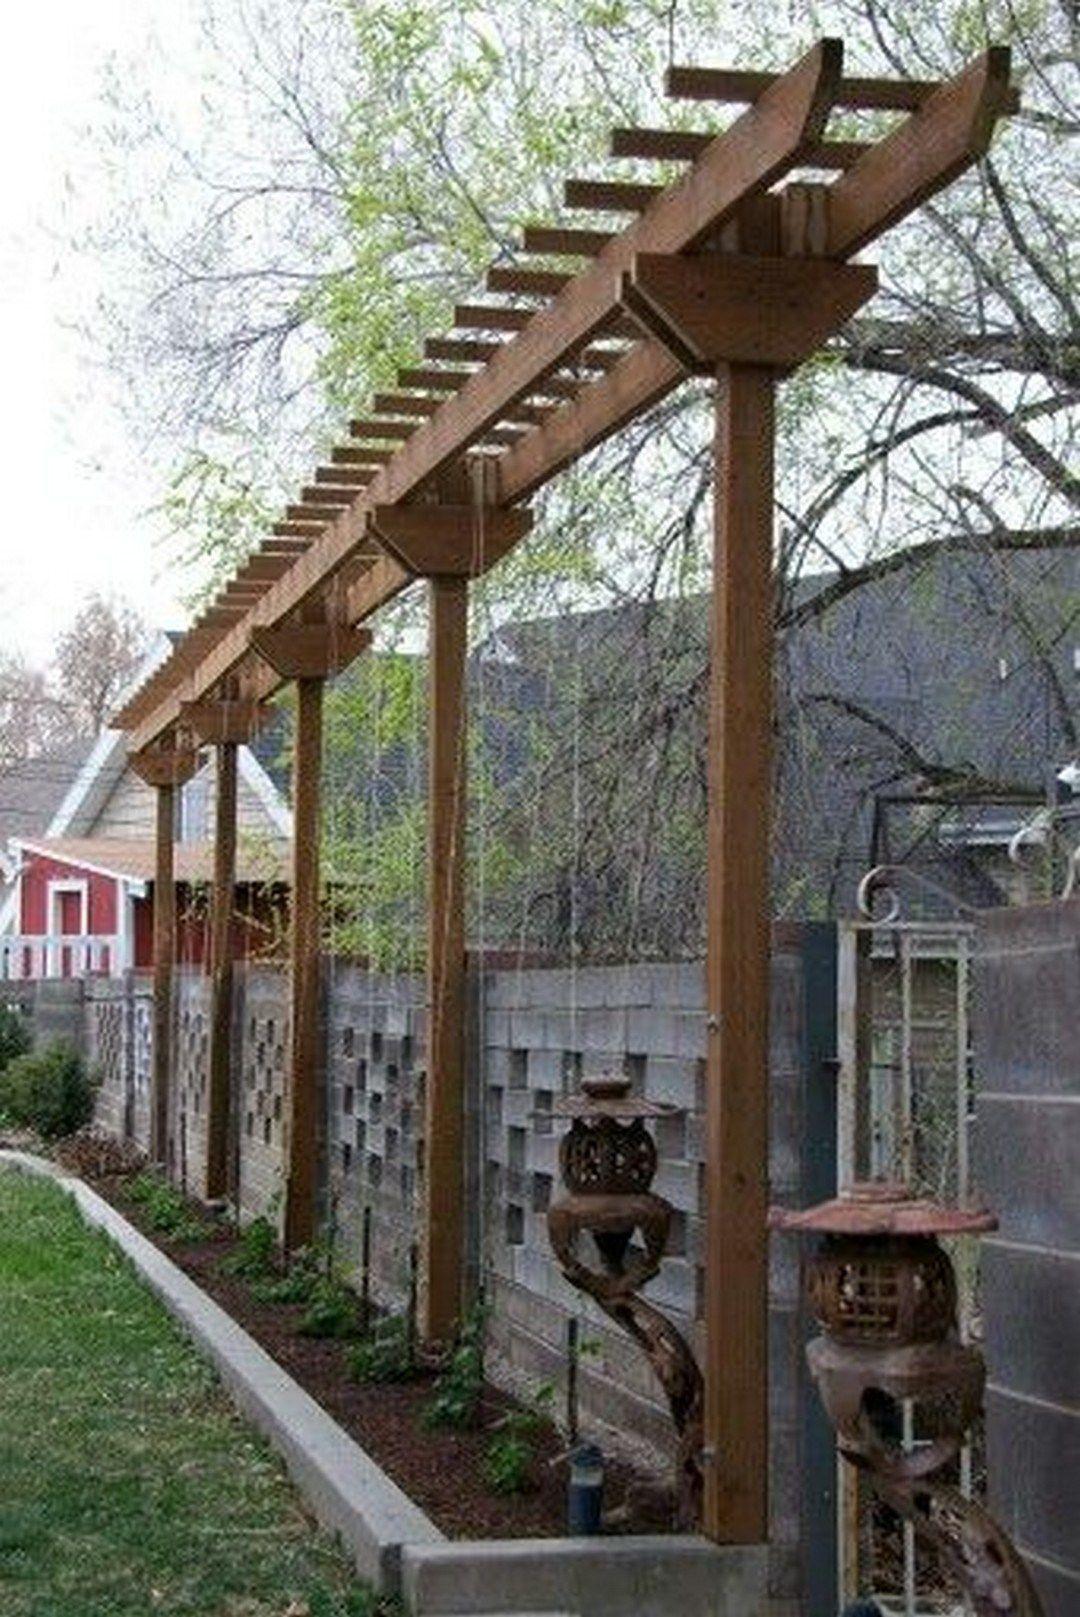 Backyard Trellis Ideas diy backyard pergola trellis ideas to enhance the outdoor life (12